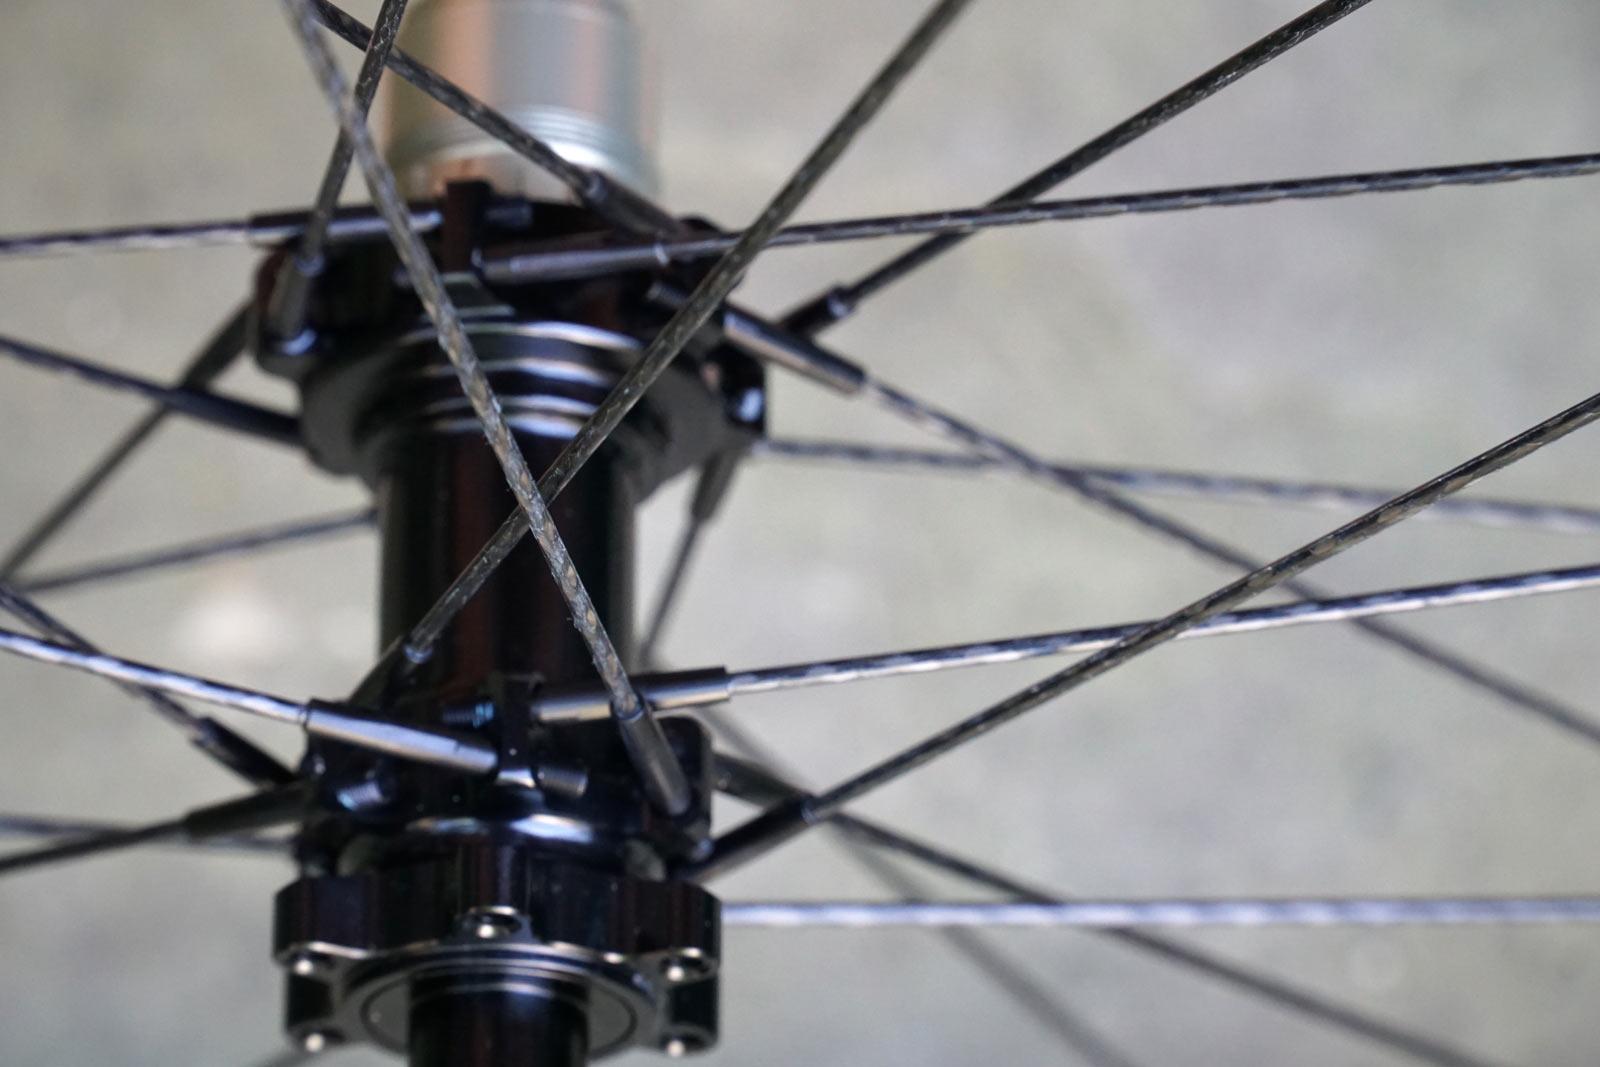 gulo composites braided carbon fiber spokes closeup detail